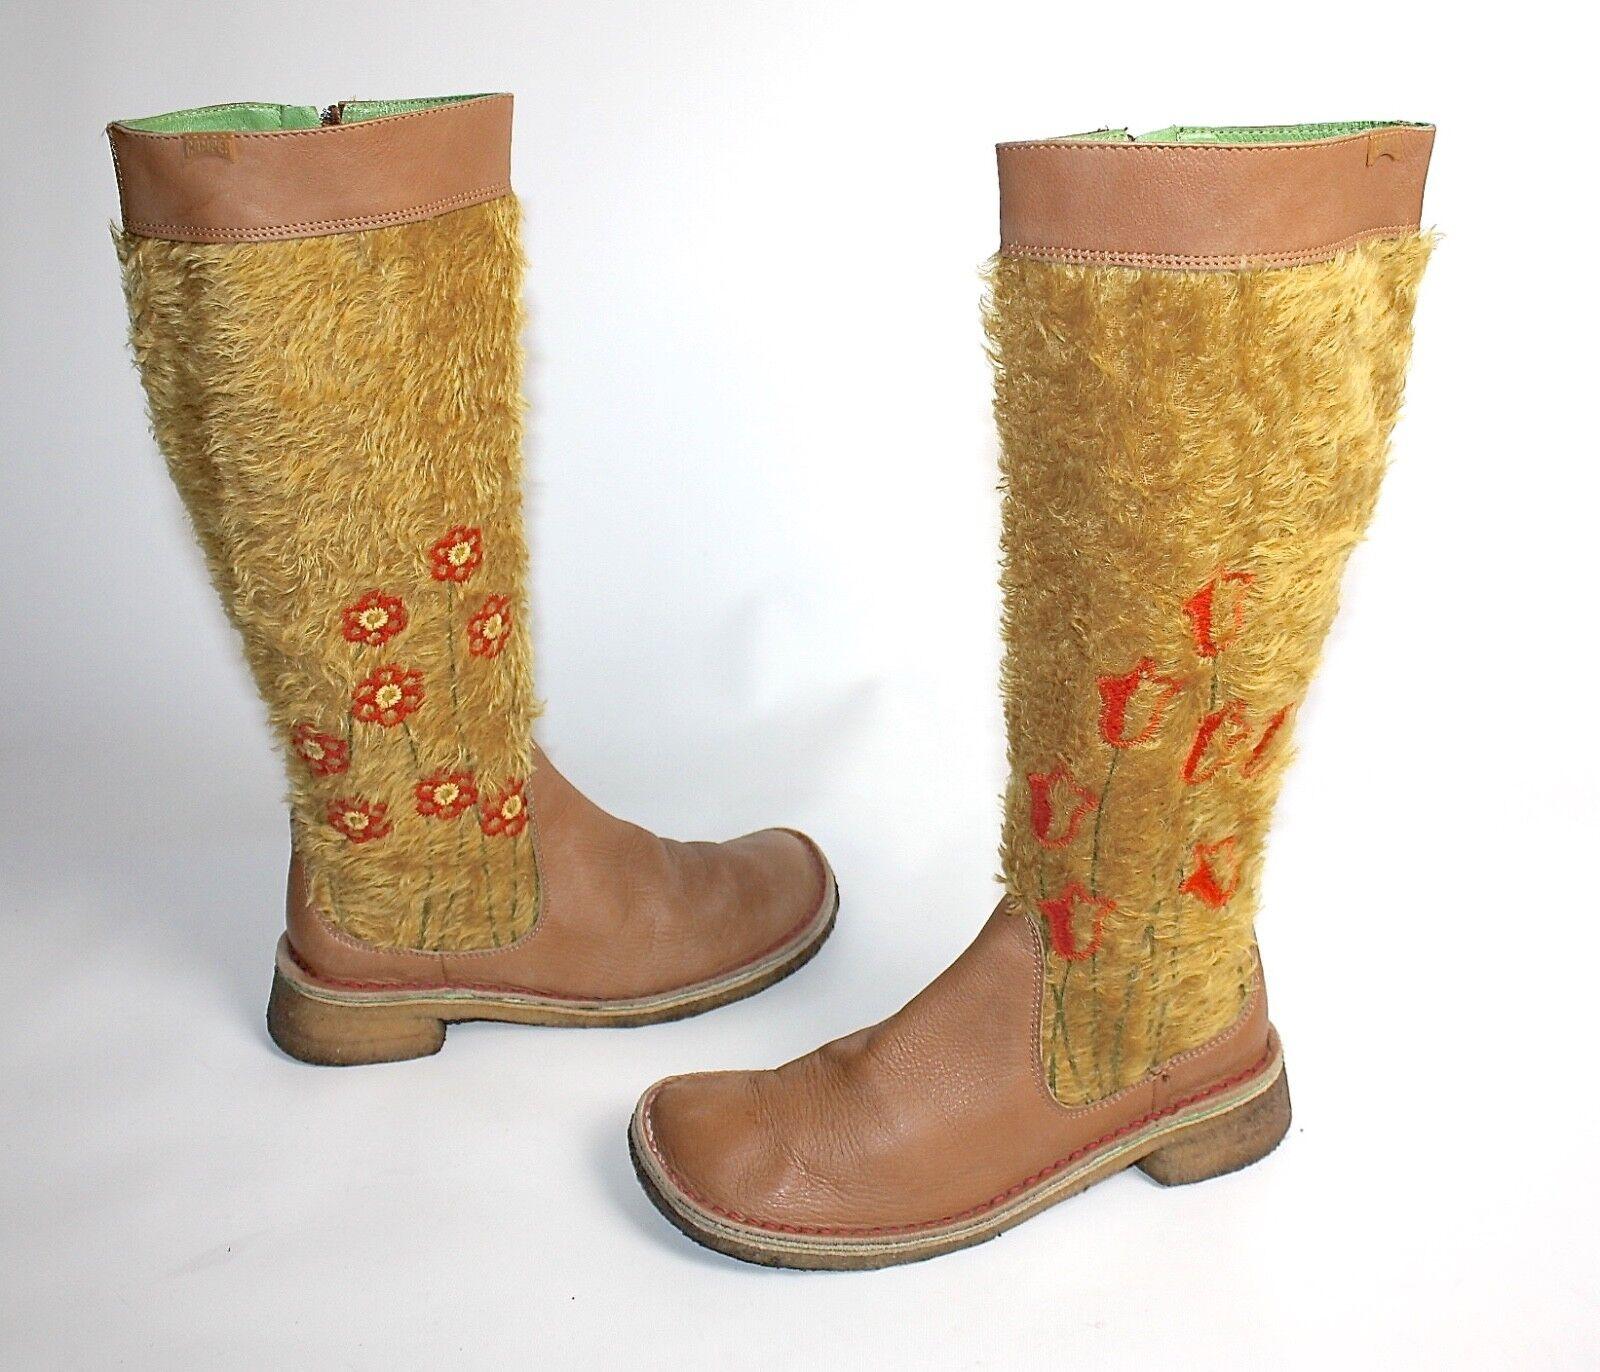 Zapatos especiales con descuento CAMPER TWINS ! HÜBSCHE DAMENSTIEFEL BRAUN KUNSTFELL BLUMEN 37 #18803030CX37#